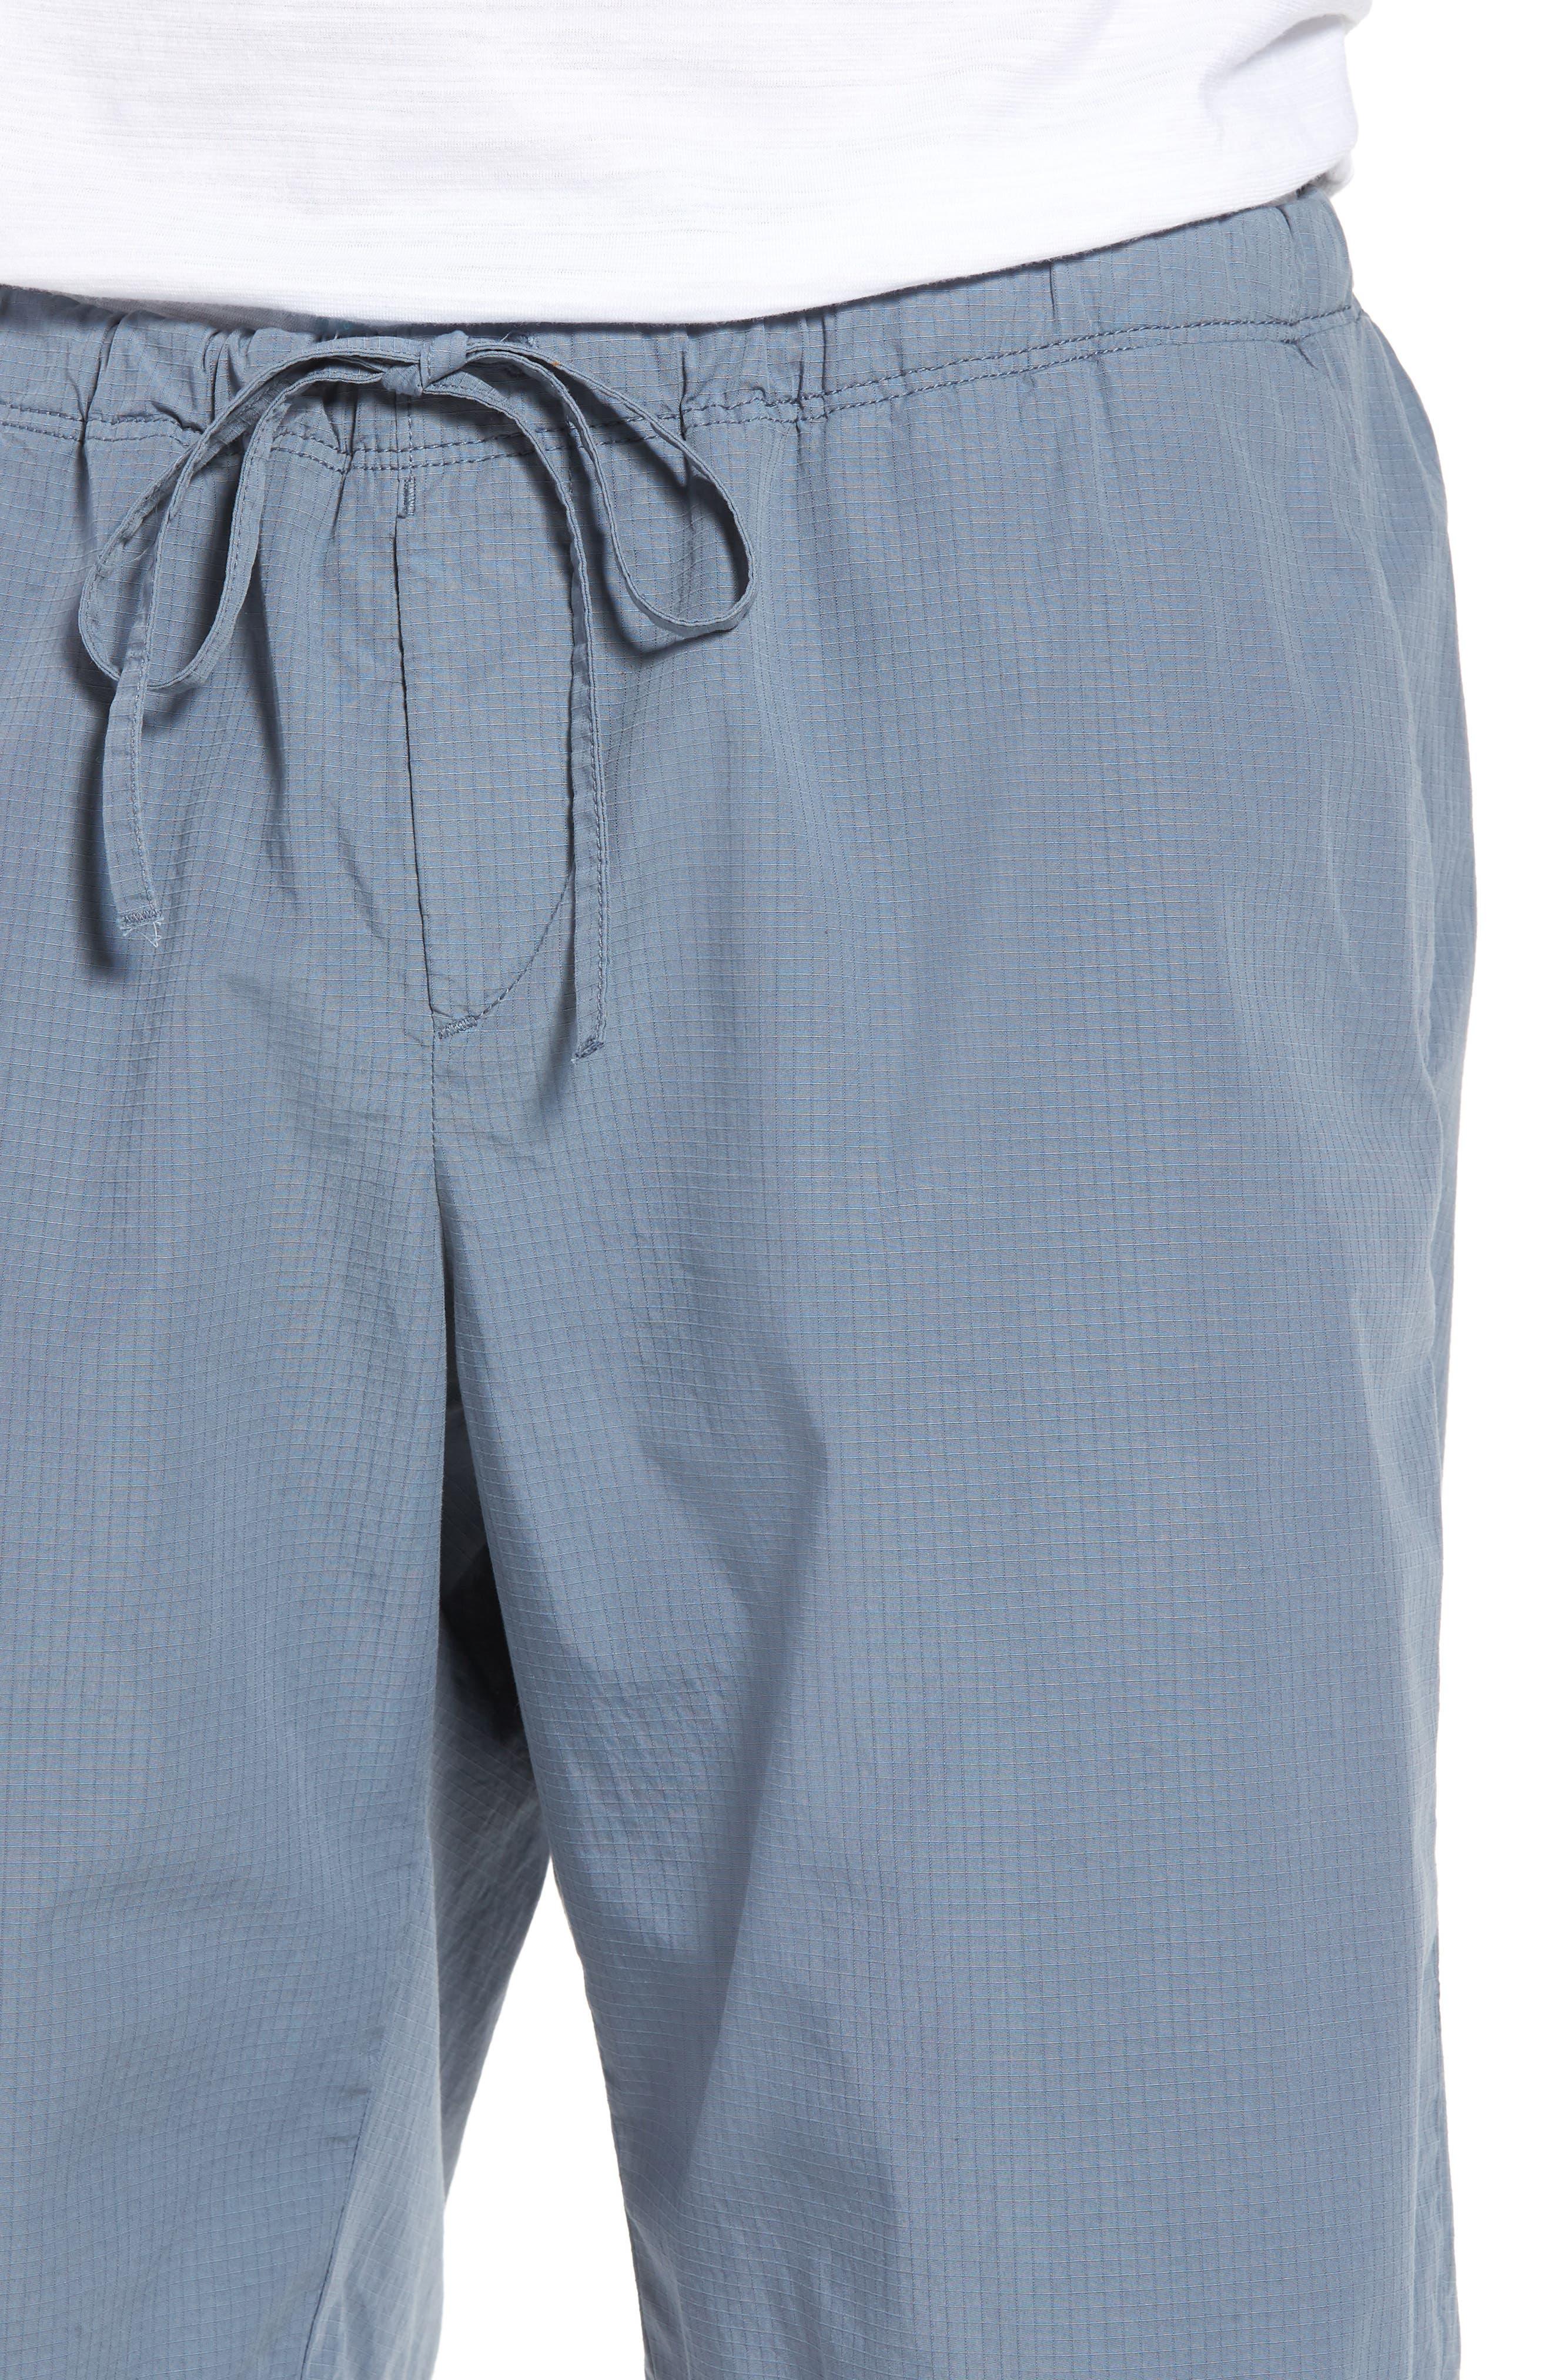 Passeo Cotton Shorts,                             Alternate thumbnail 4, color,                             GREY